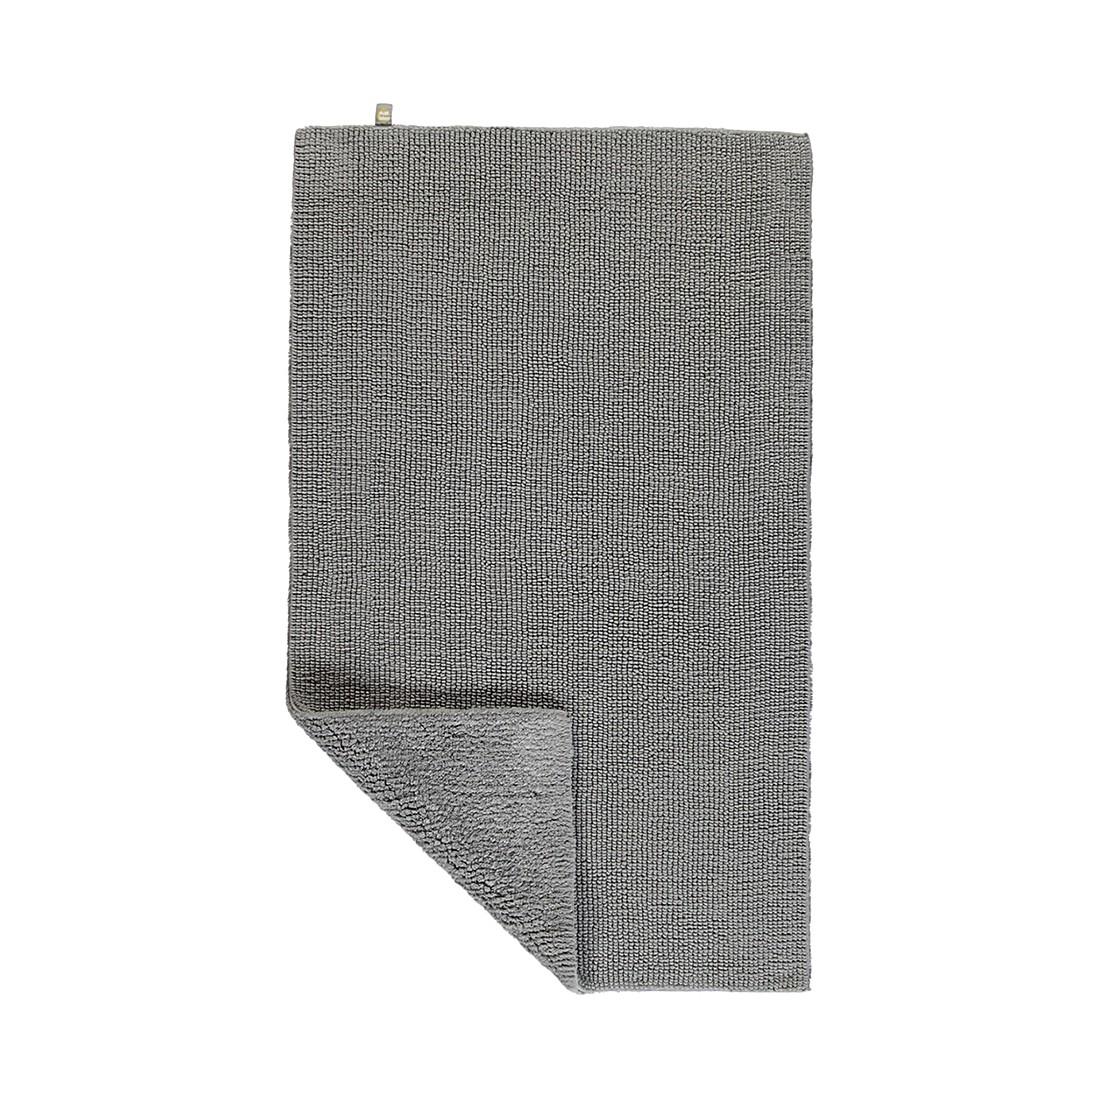 Badteppiche Pur - 100% Baumwolle kiesel - 85 - 70 x 130 cm, Rhomtuft